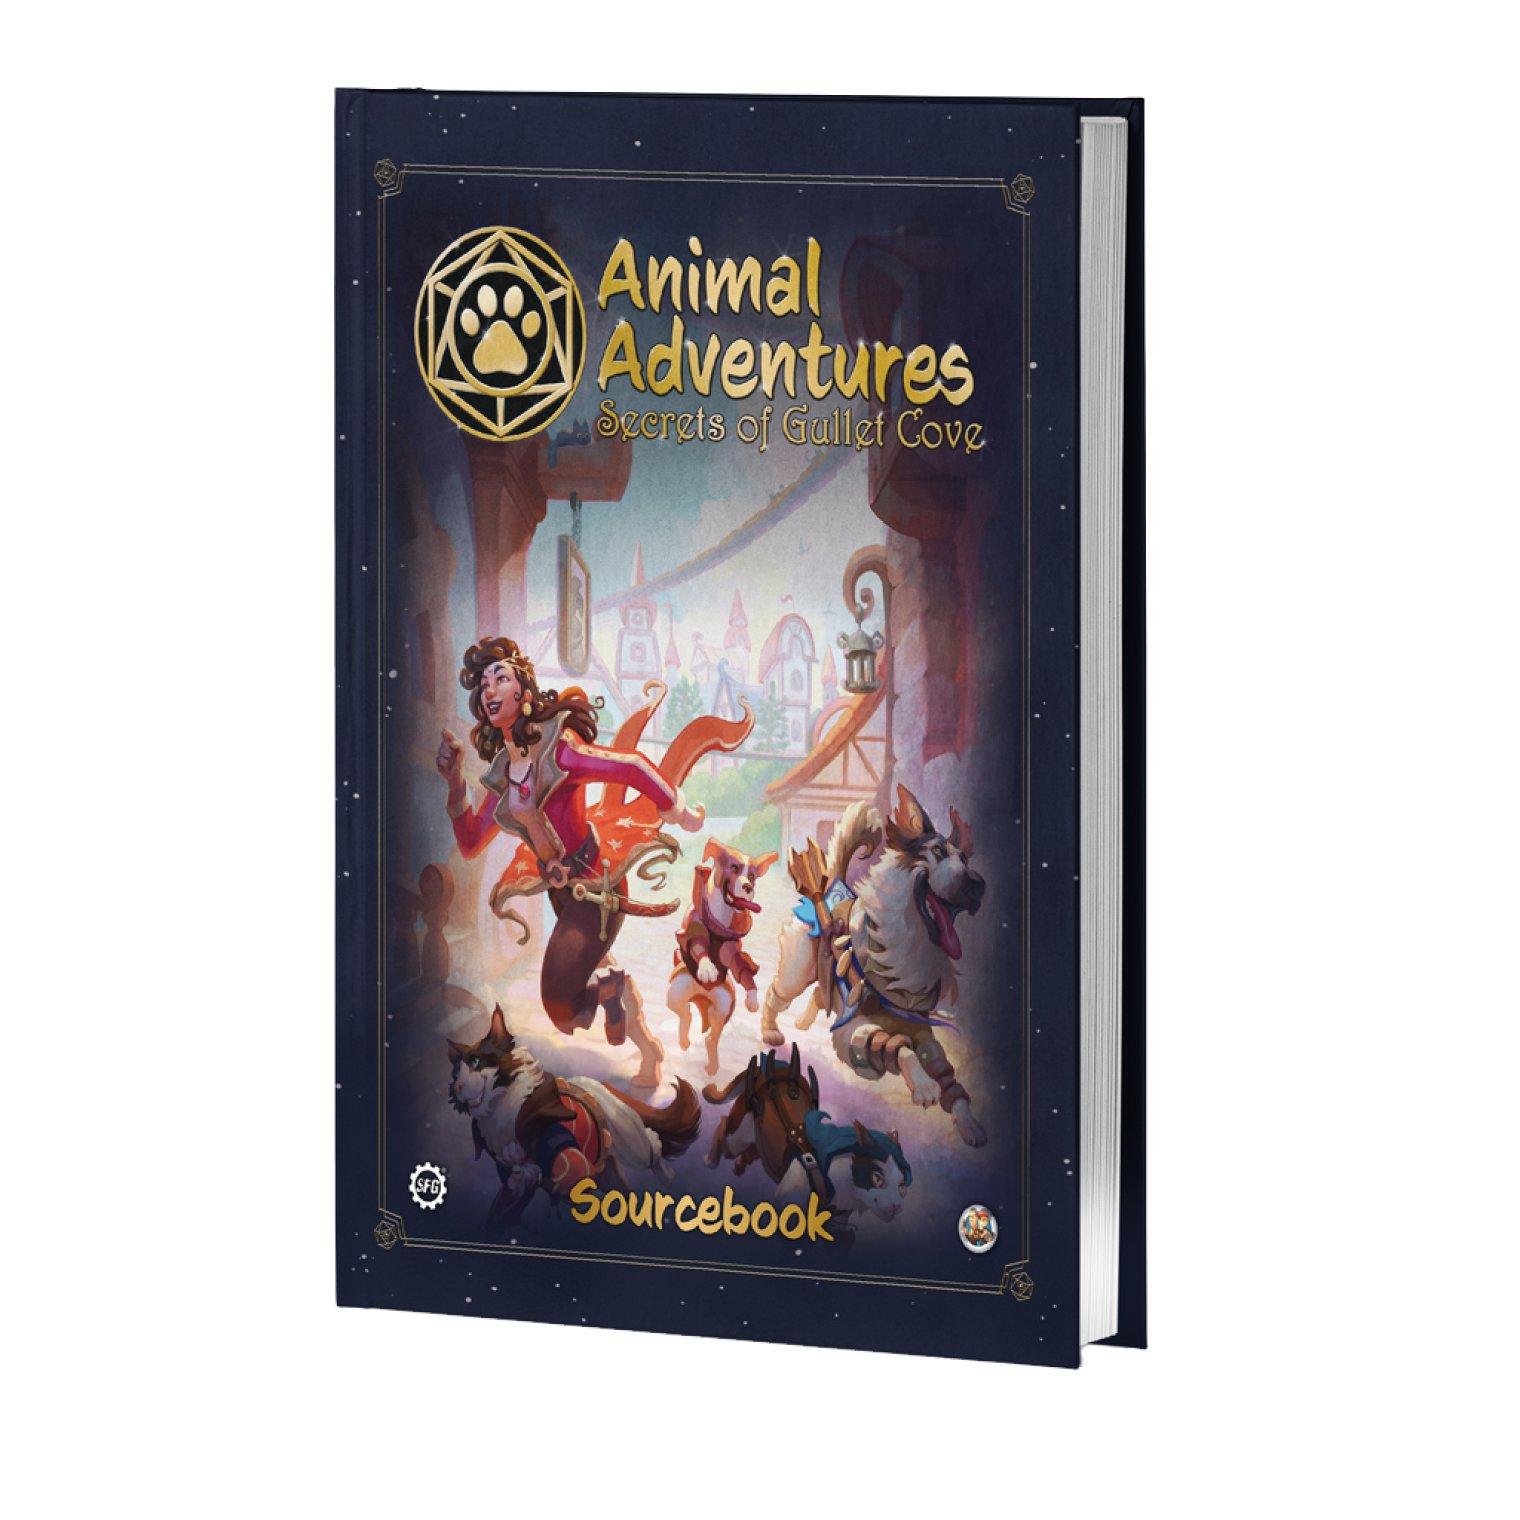 Animal Adventures: Secrets of Gullet Cove - Sourcebook